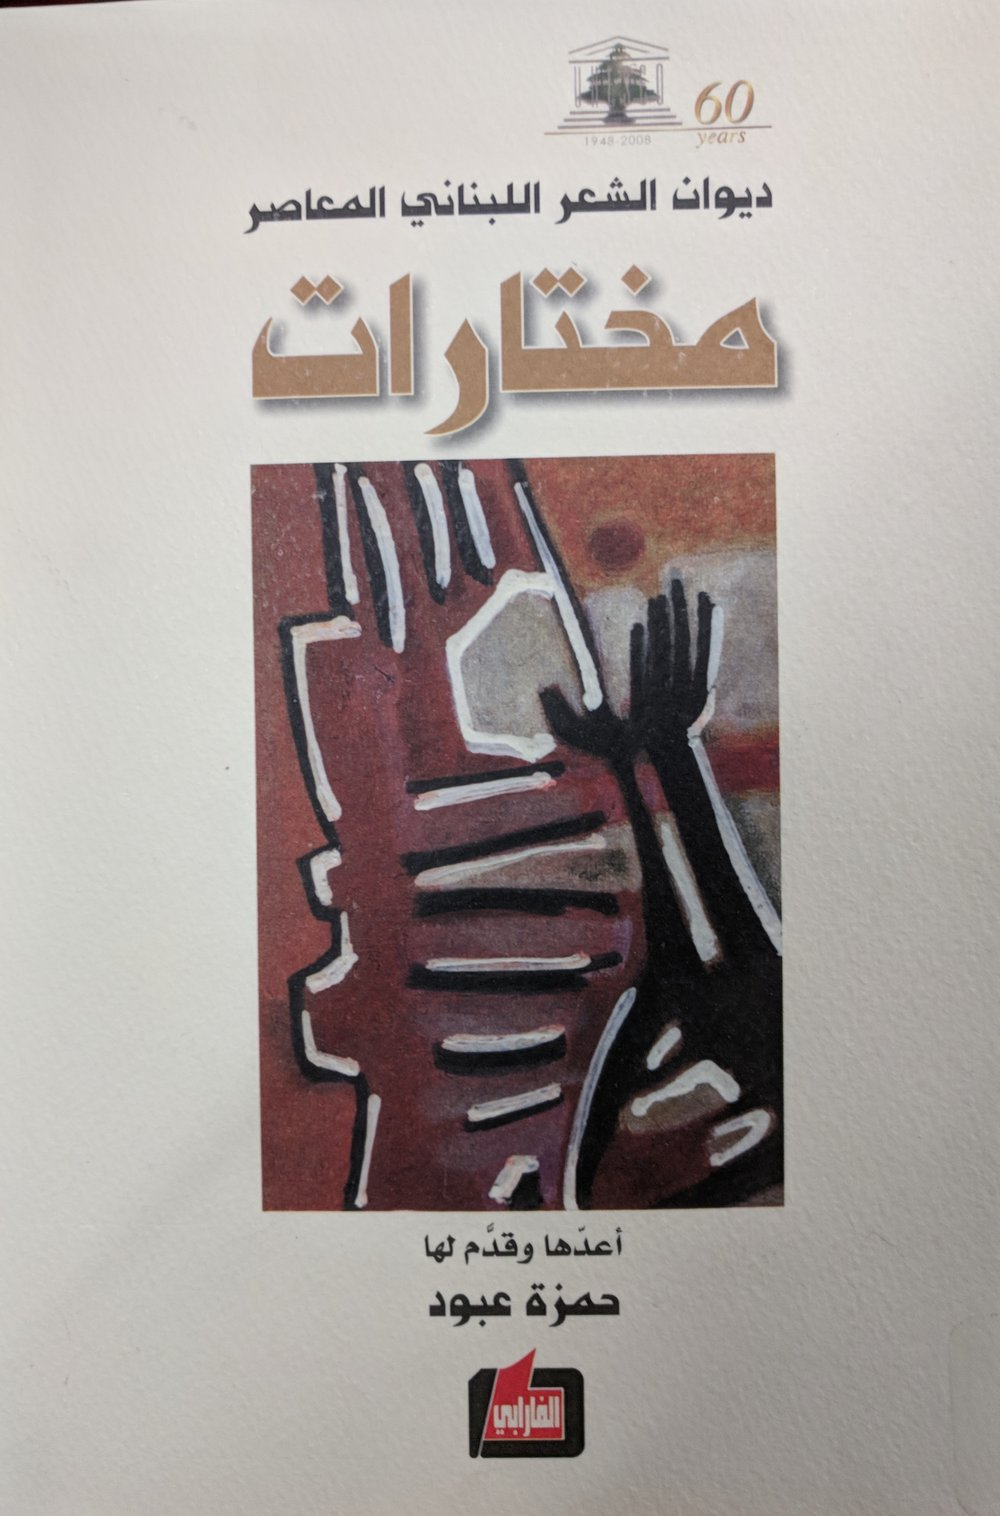 Dīwān al-shiʻr al-Lubnānī al-muʻāṣir: mukhtārāt ,aʻaddahā wa-qaddama la-hā Ḥamzah ʻAbbūd (Bayrūt : Dār al-Fārābī, 2008